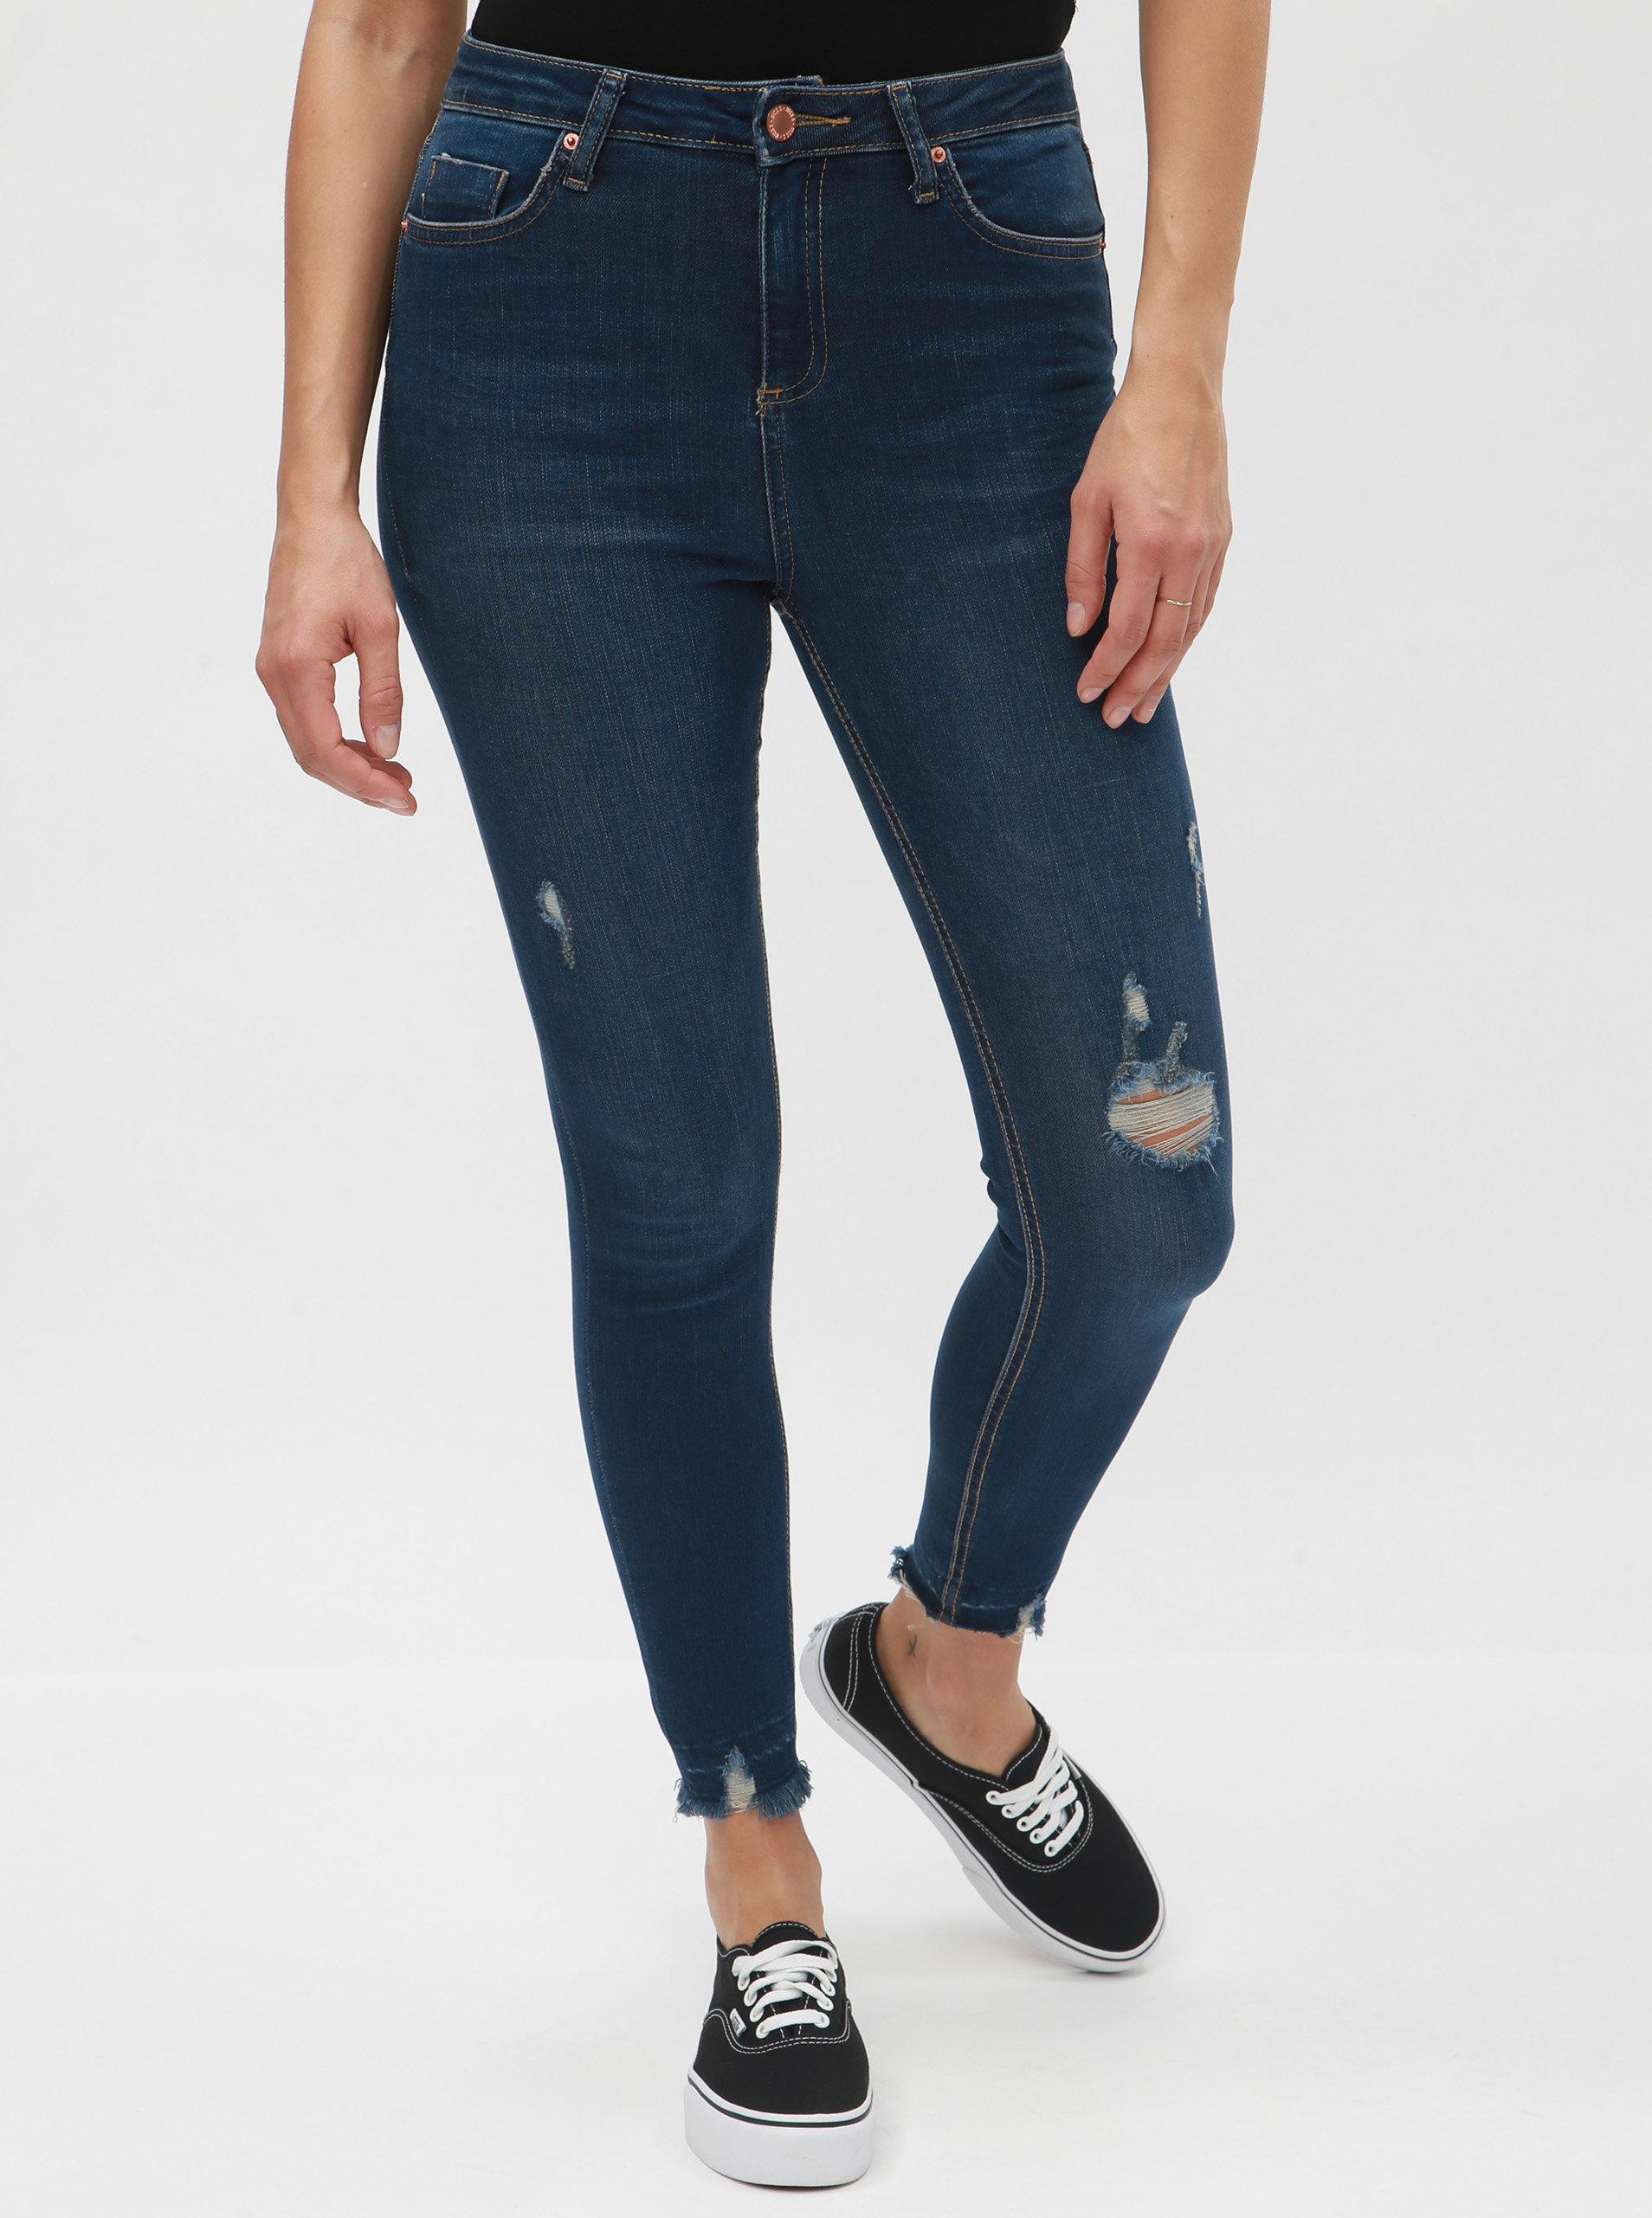 687fdf00b2b4 Tmavě modré super skinny džíny s potrhaným efektem Miss Selfridge Lizzie ...